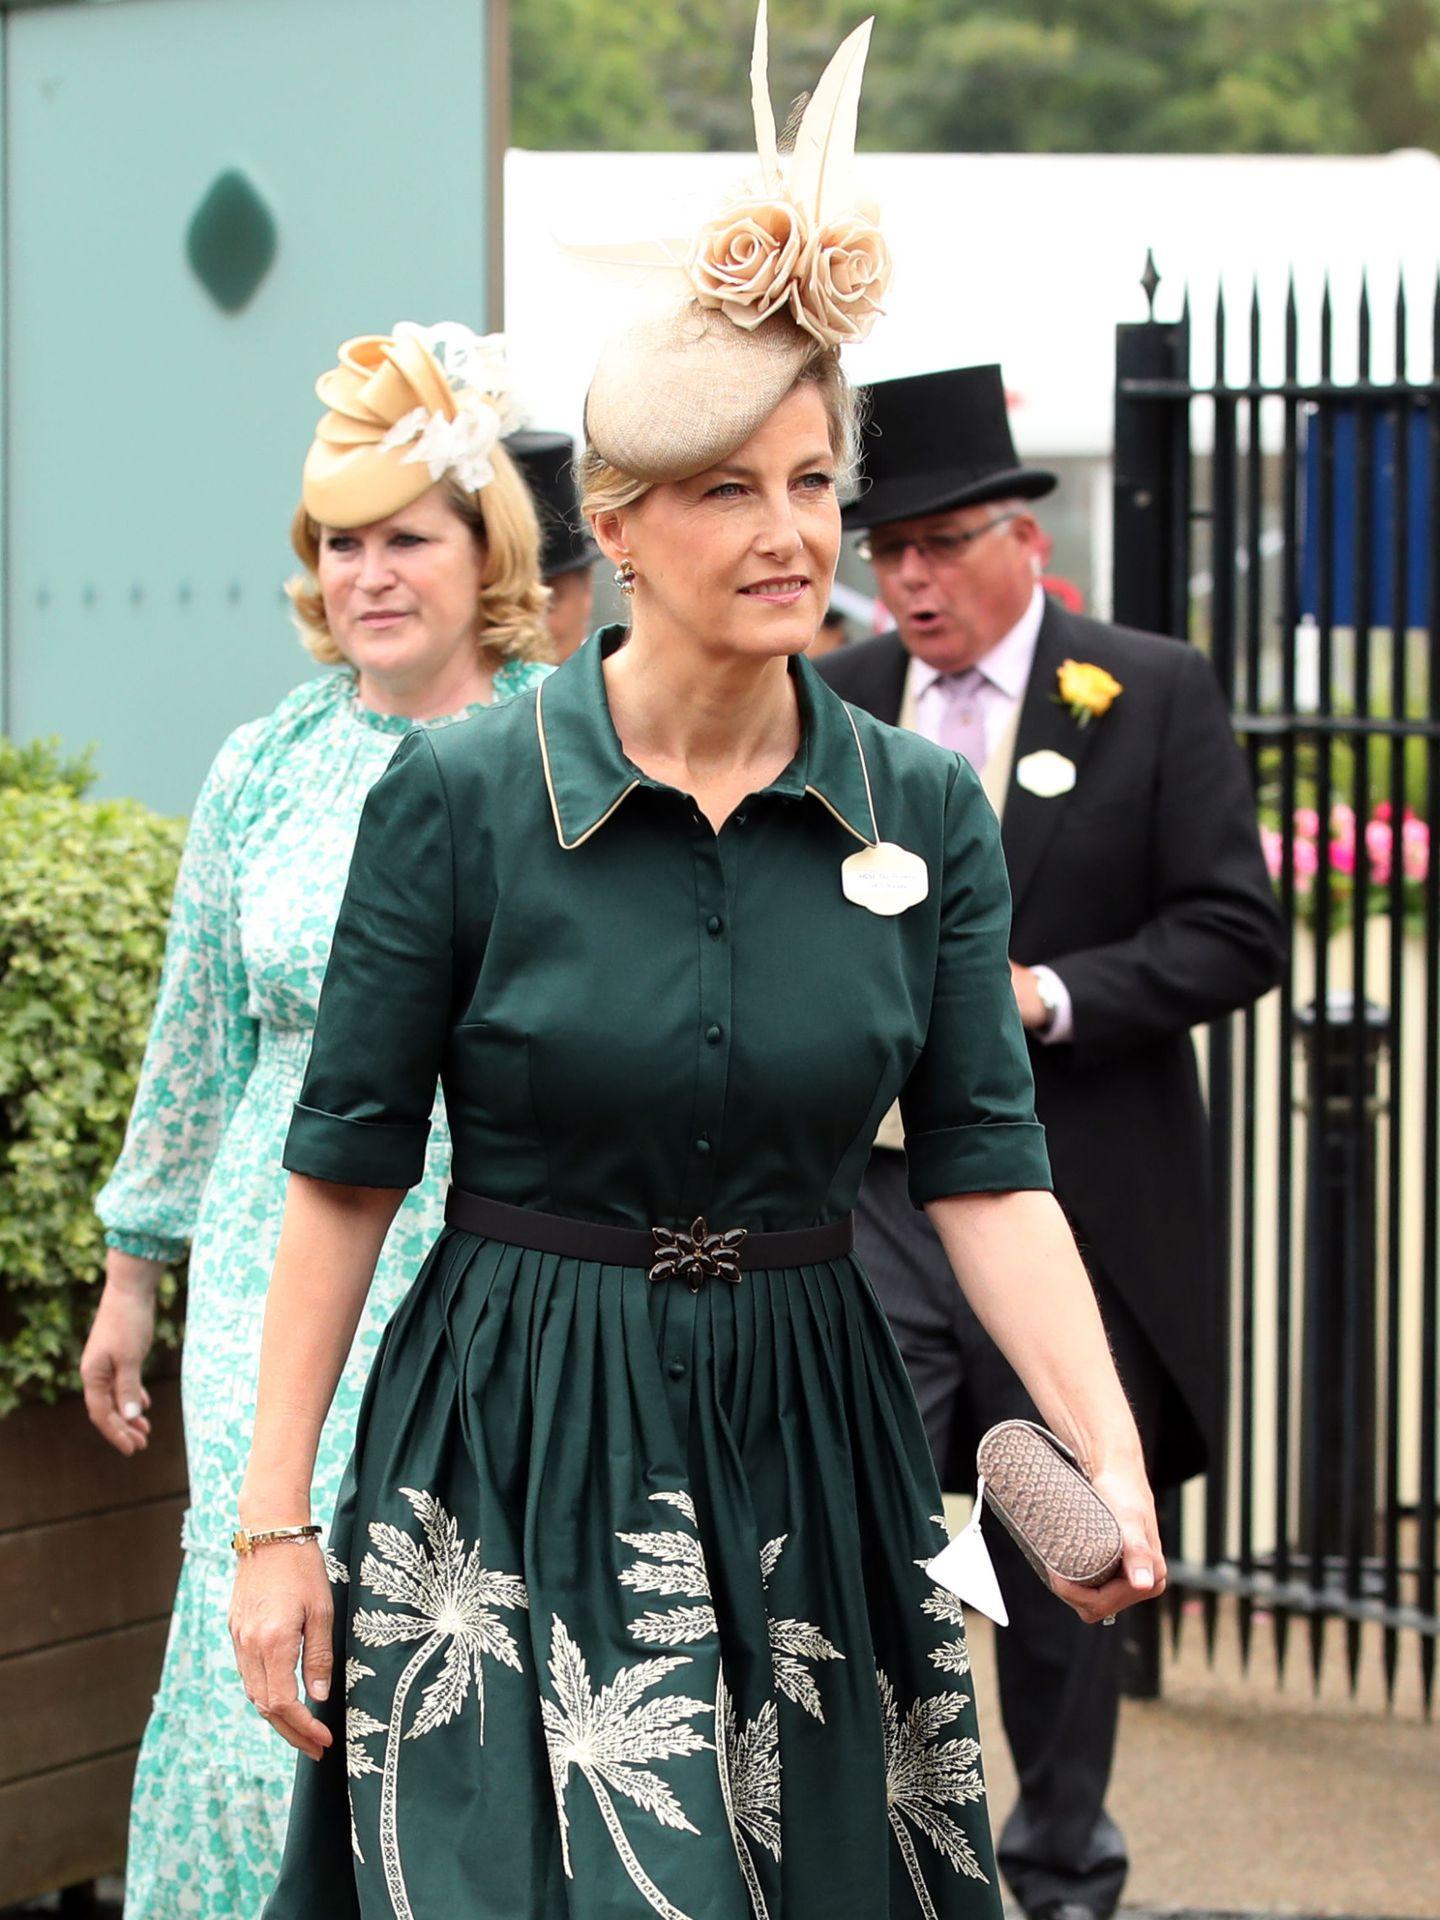 Sofía, condesa de Wessex, en el tercer día de Ascot. Reuters.